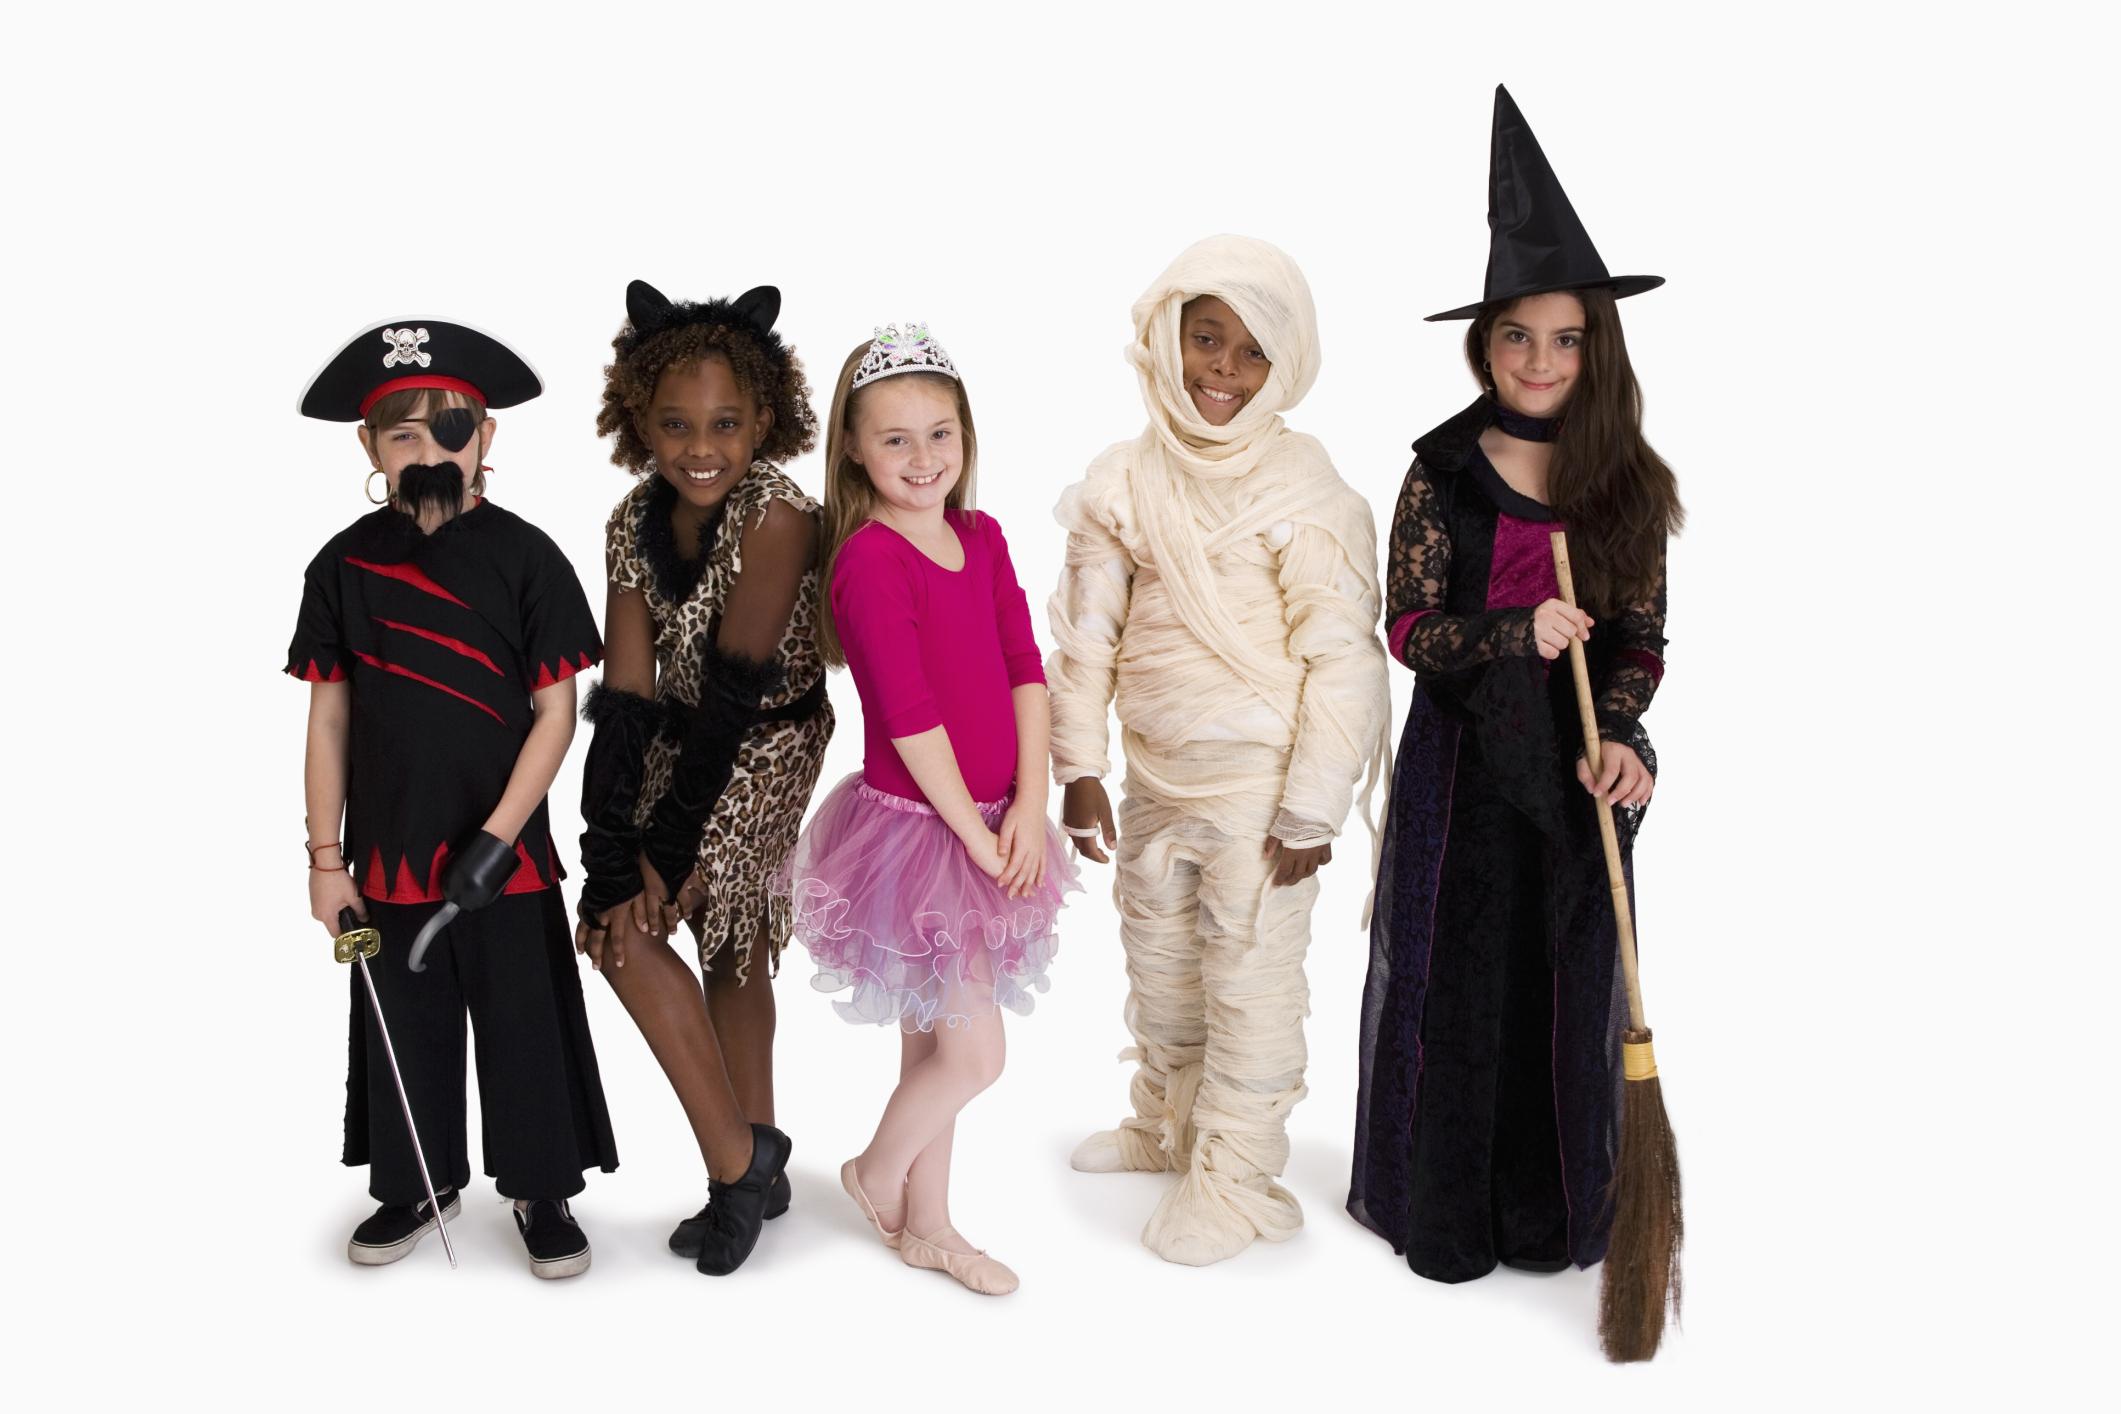 Elementary School Halloween Party Games